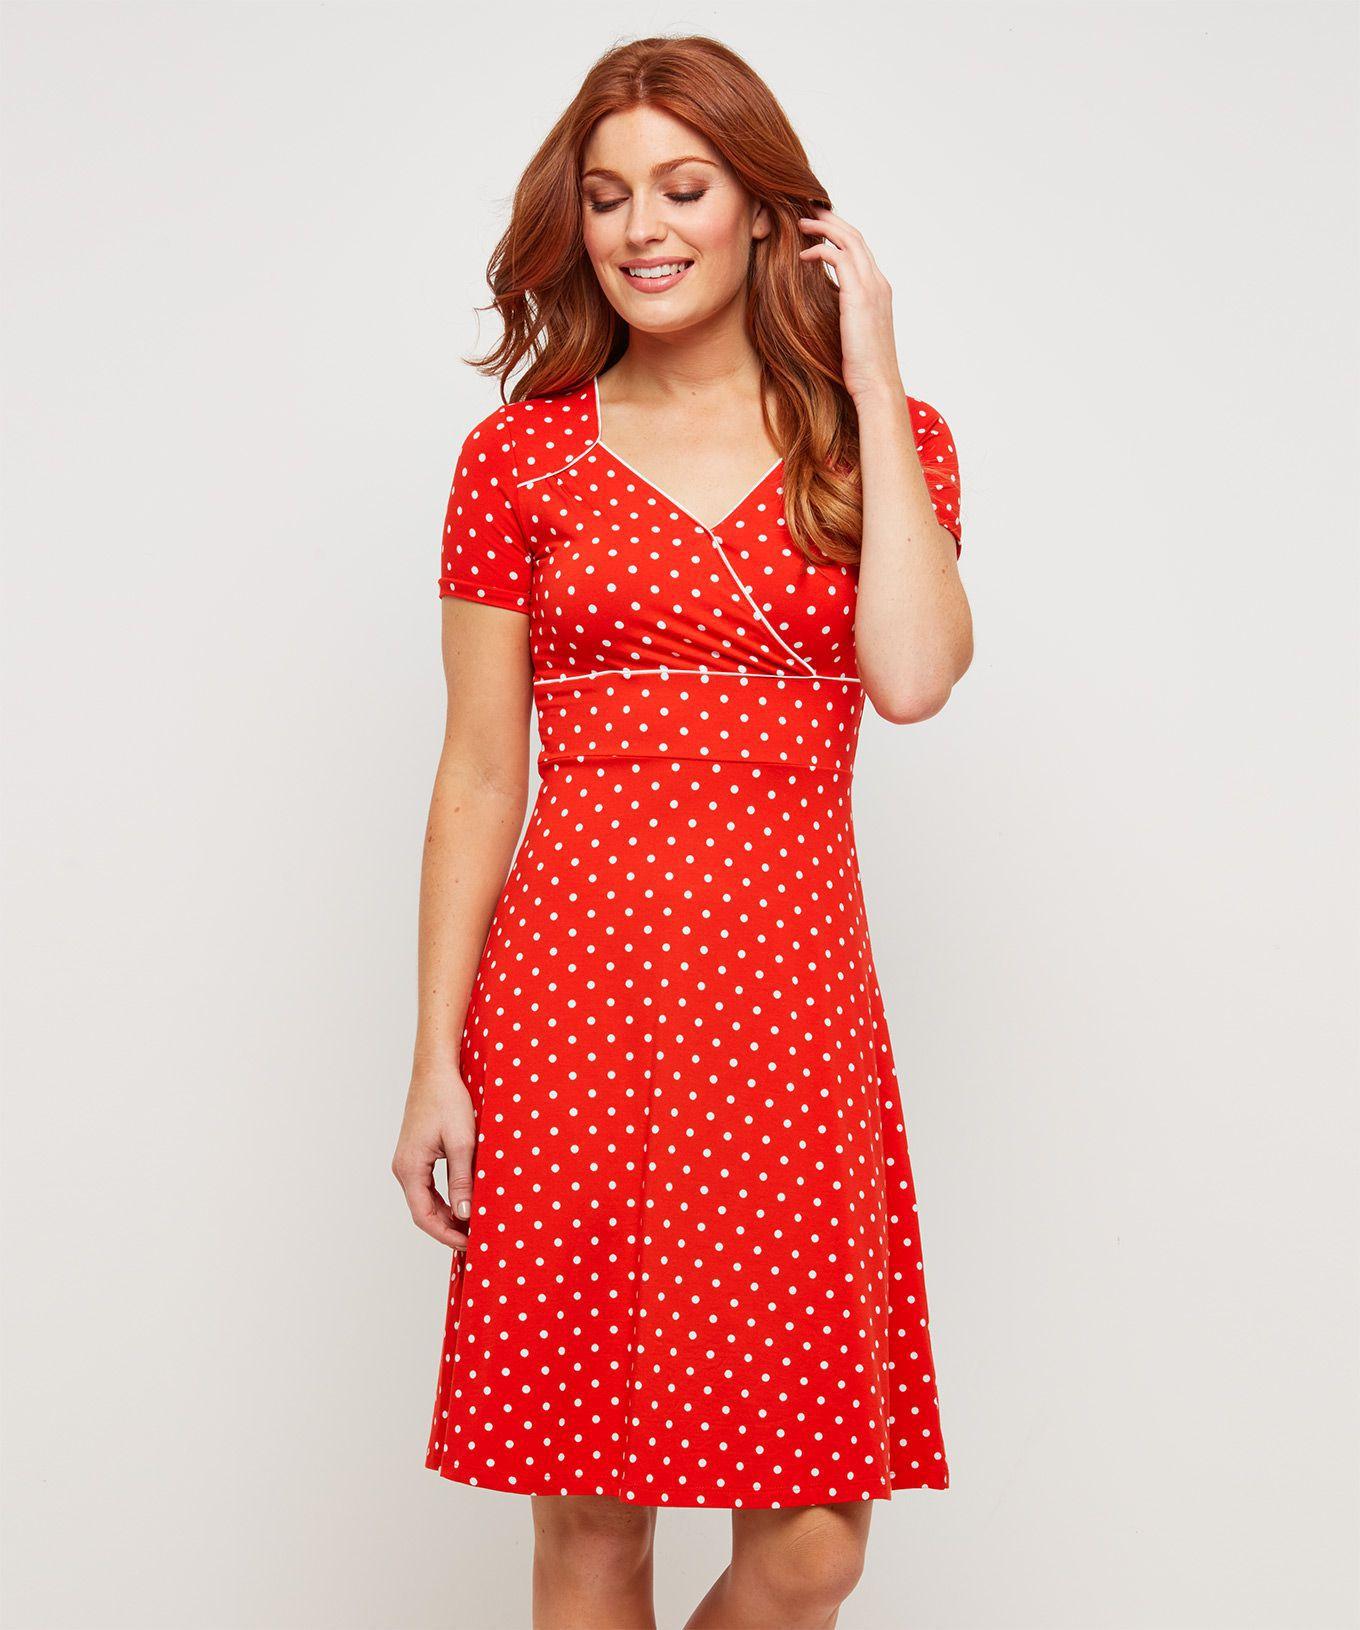 584b60140914 Joe Browns Červené bodkované šaty - JoyStore.sk